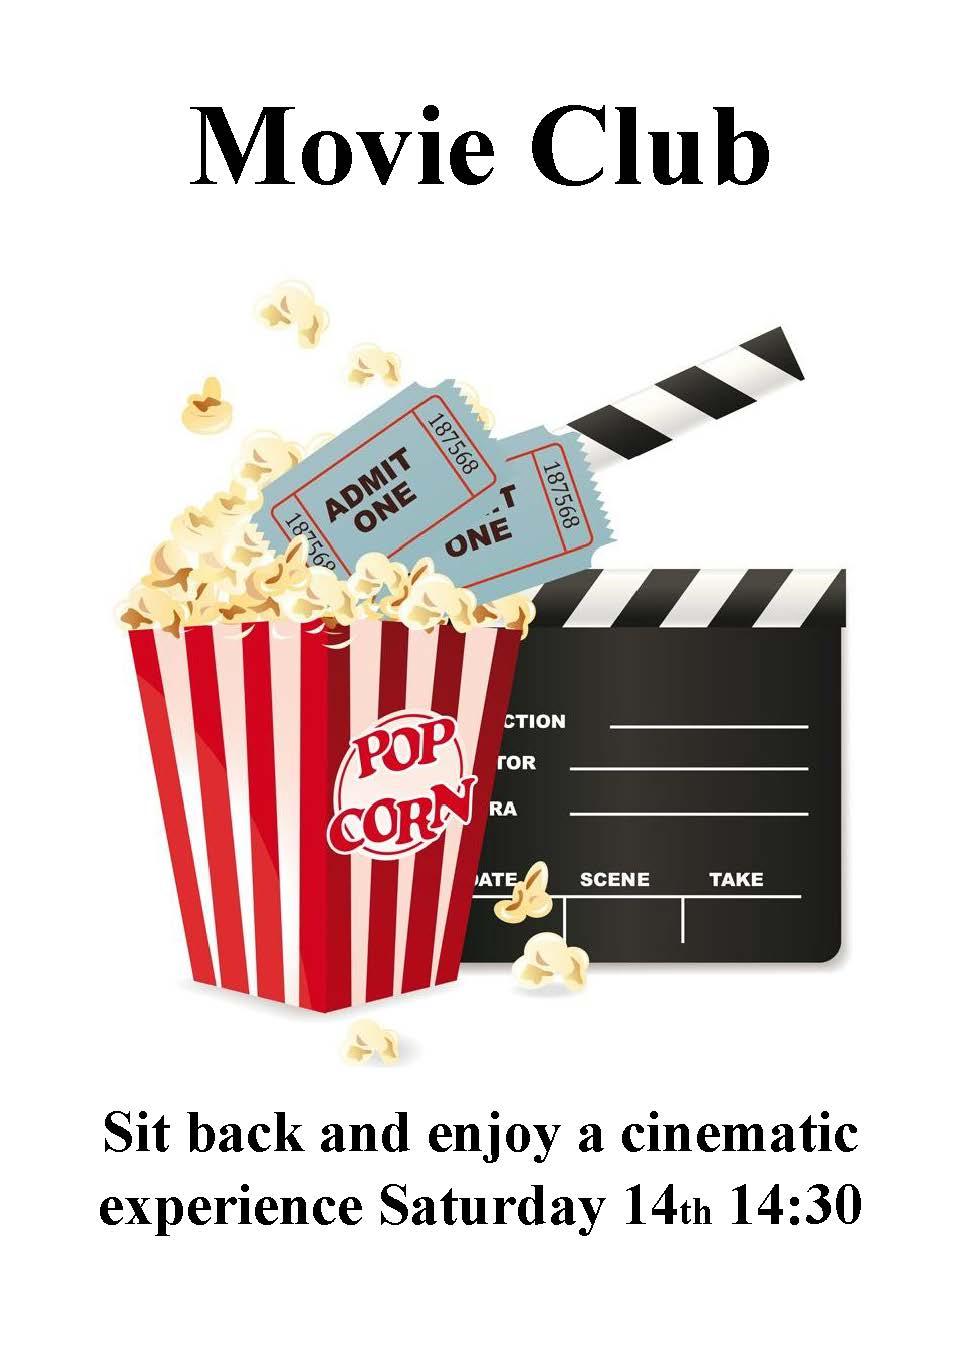 Movie club poster use